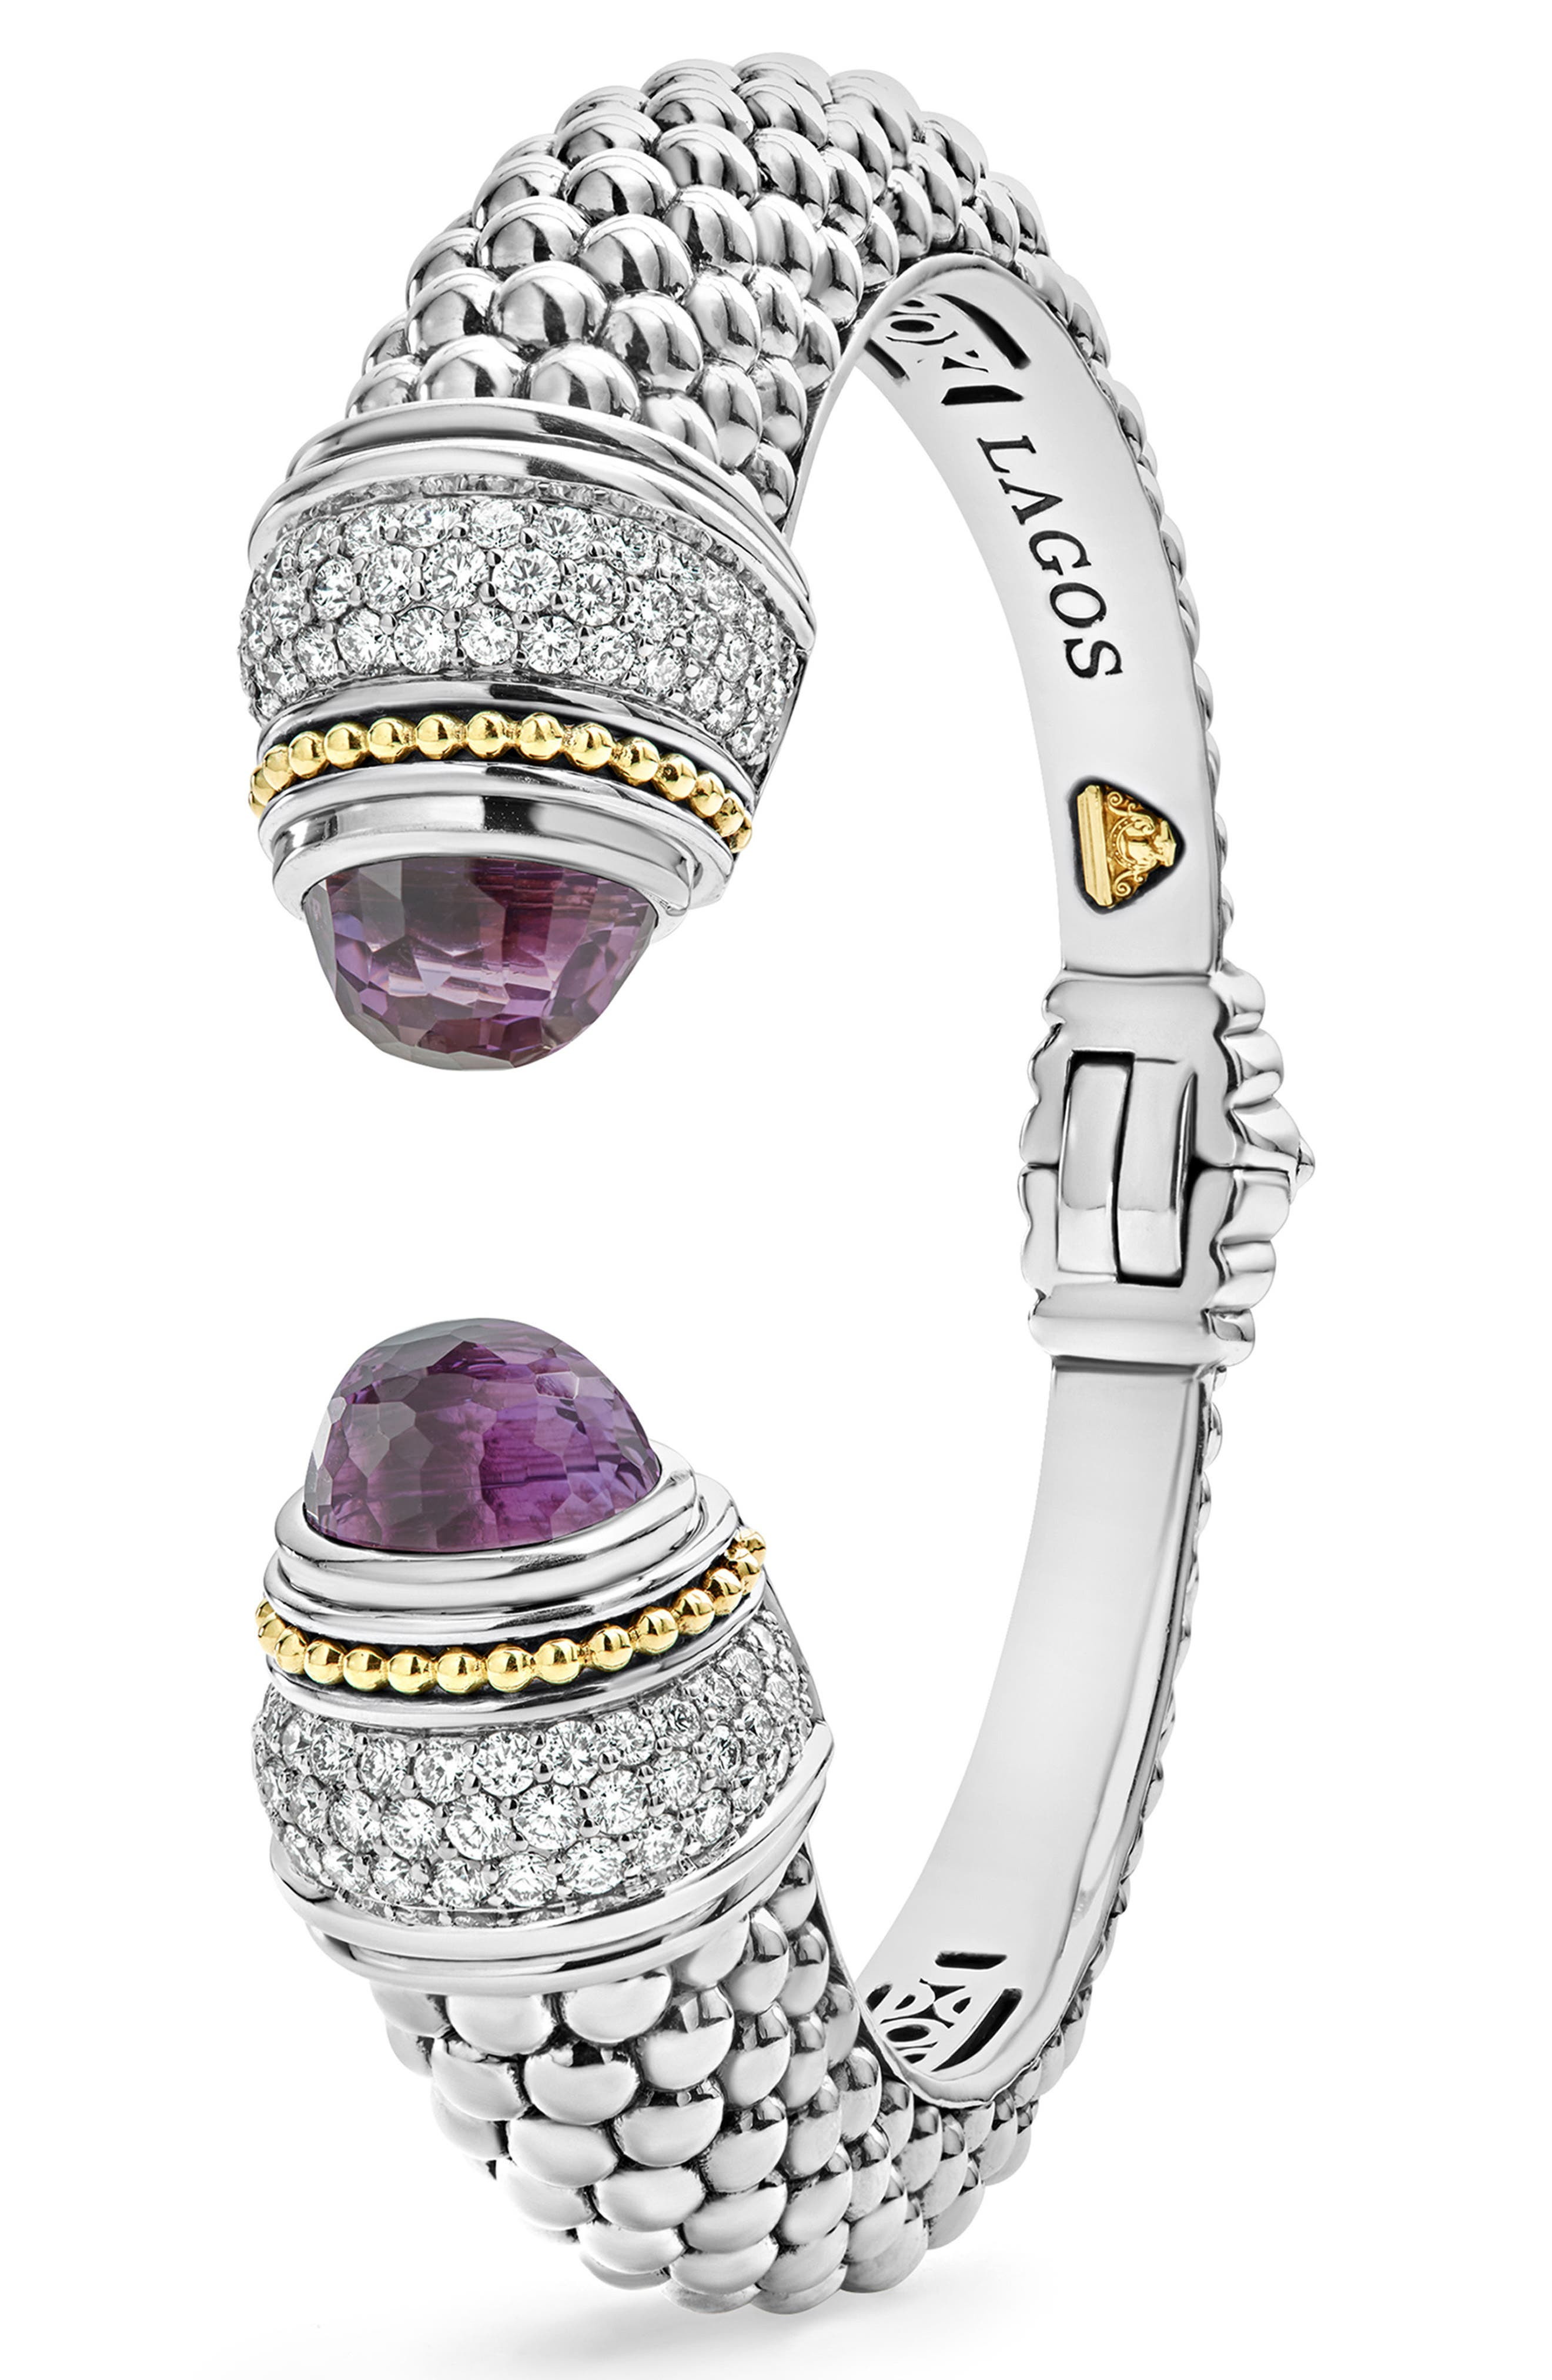 Caviar Diamond & Semiprecious Stone Wrist Cuff,                             Alternate thumbnail 4, color,                             Amethyst